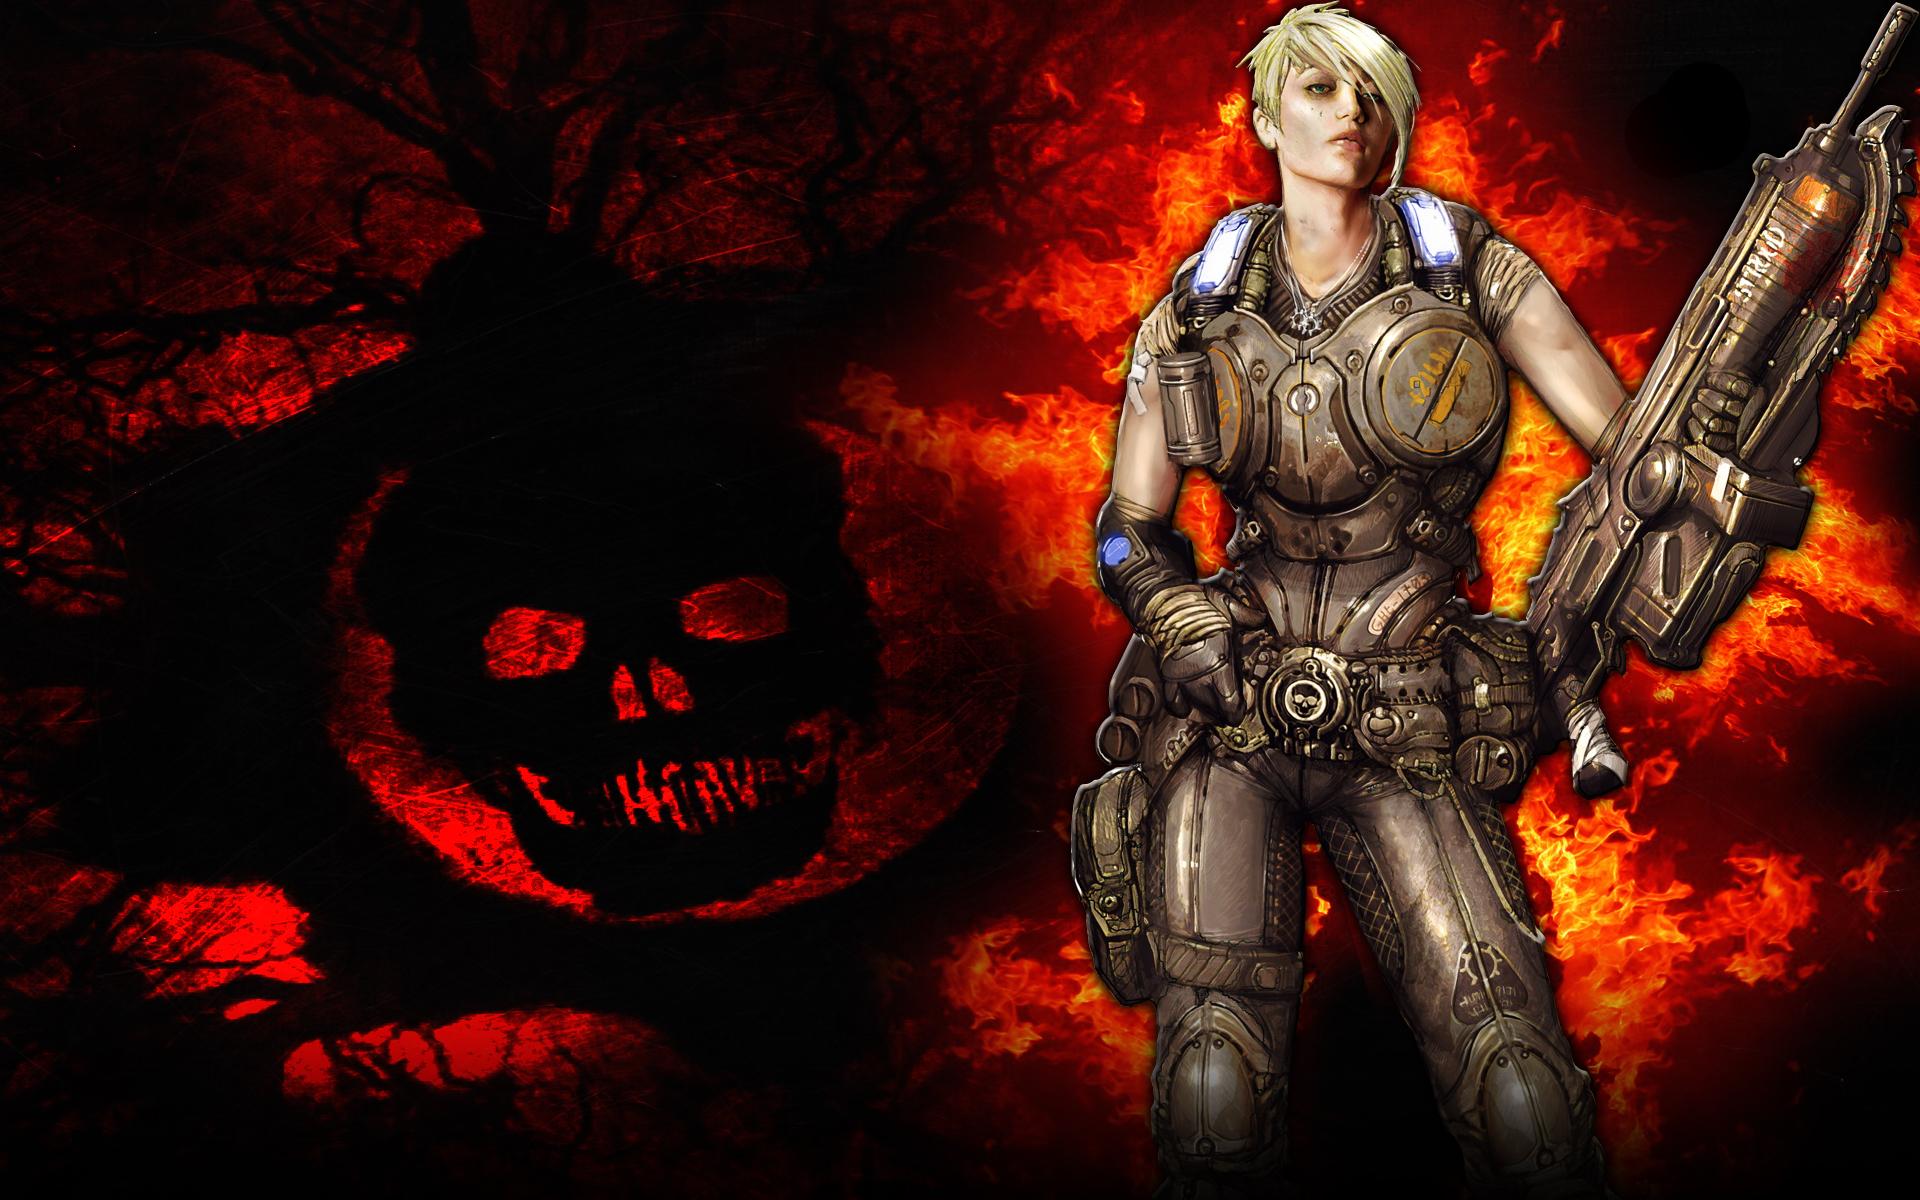 gears of war game A3